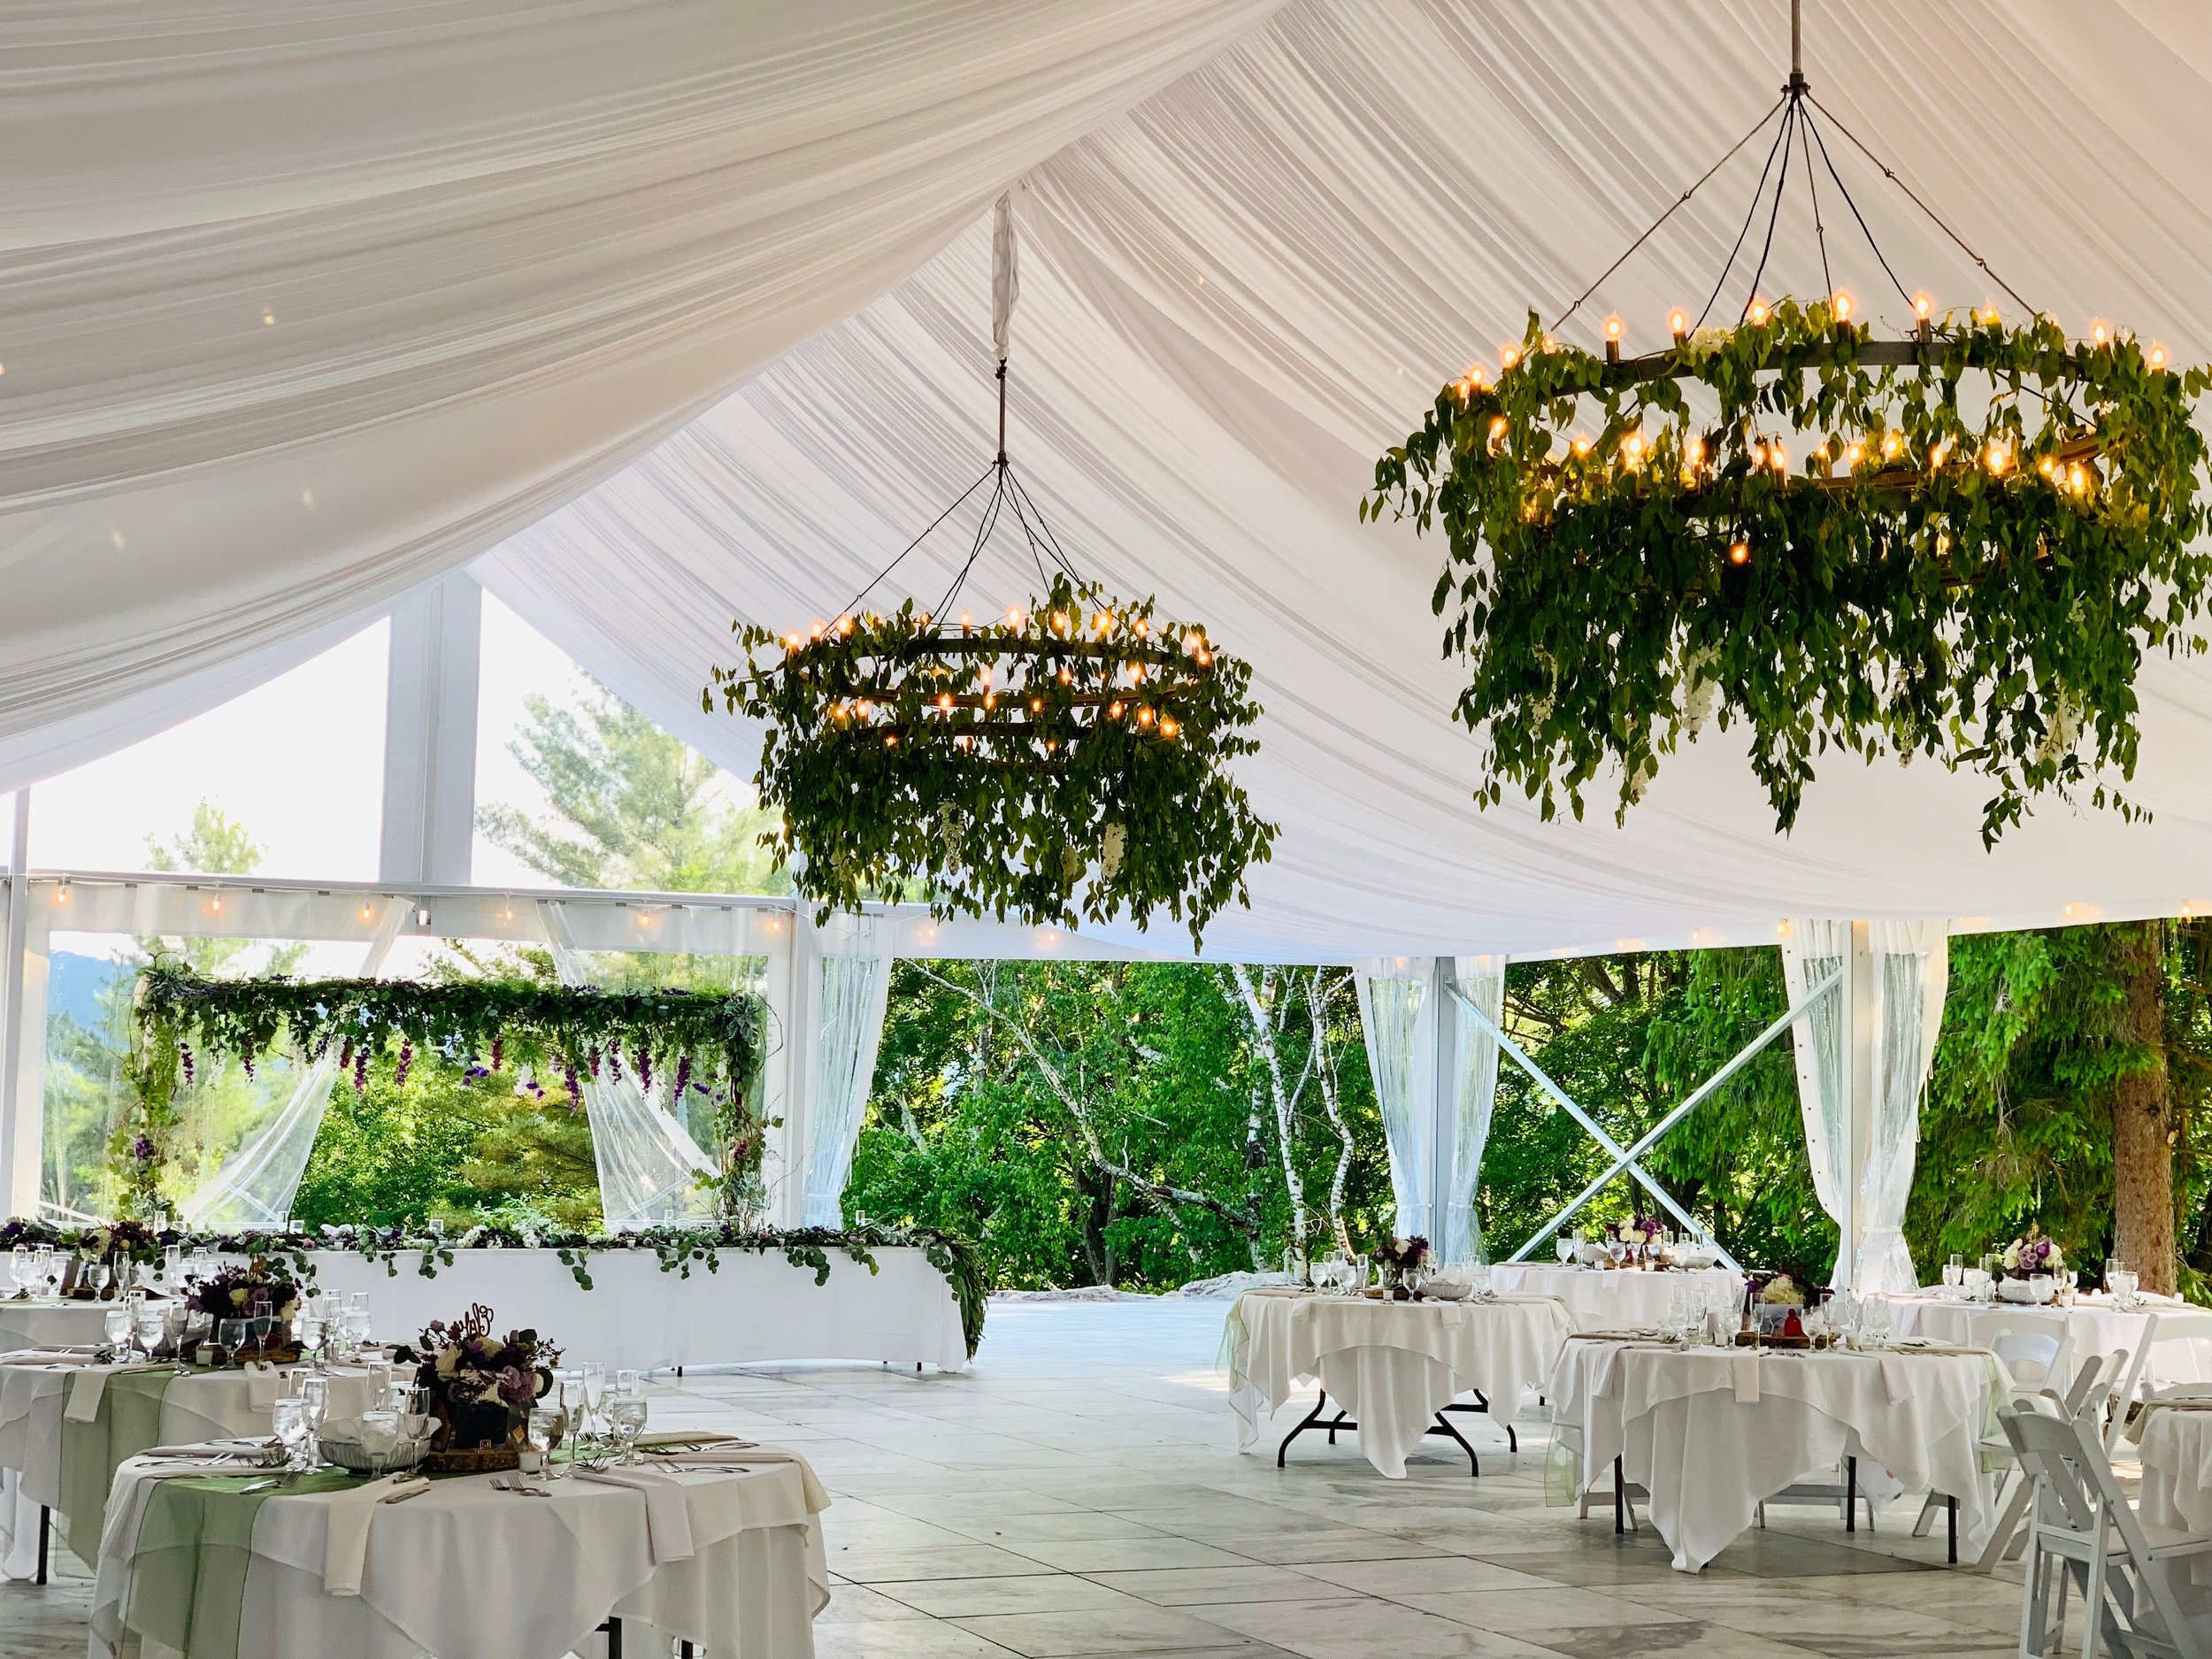 marble pavilion wedding tent .JPG